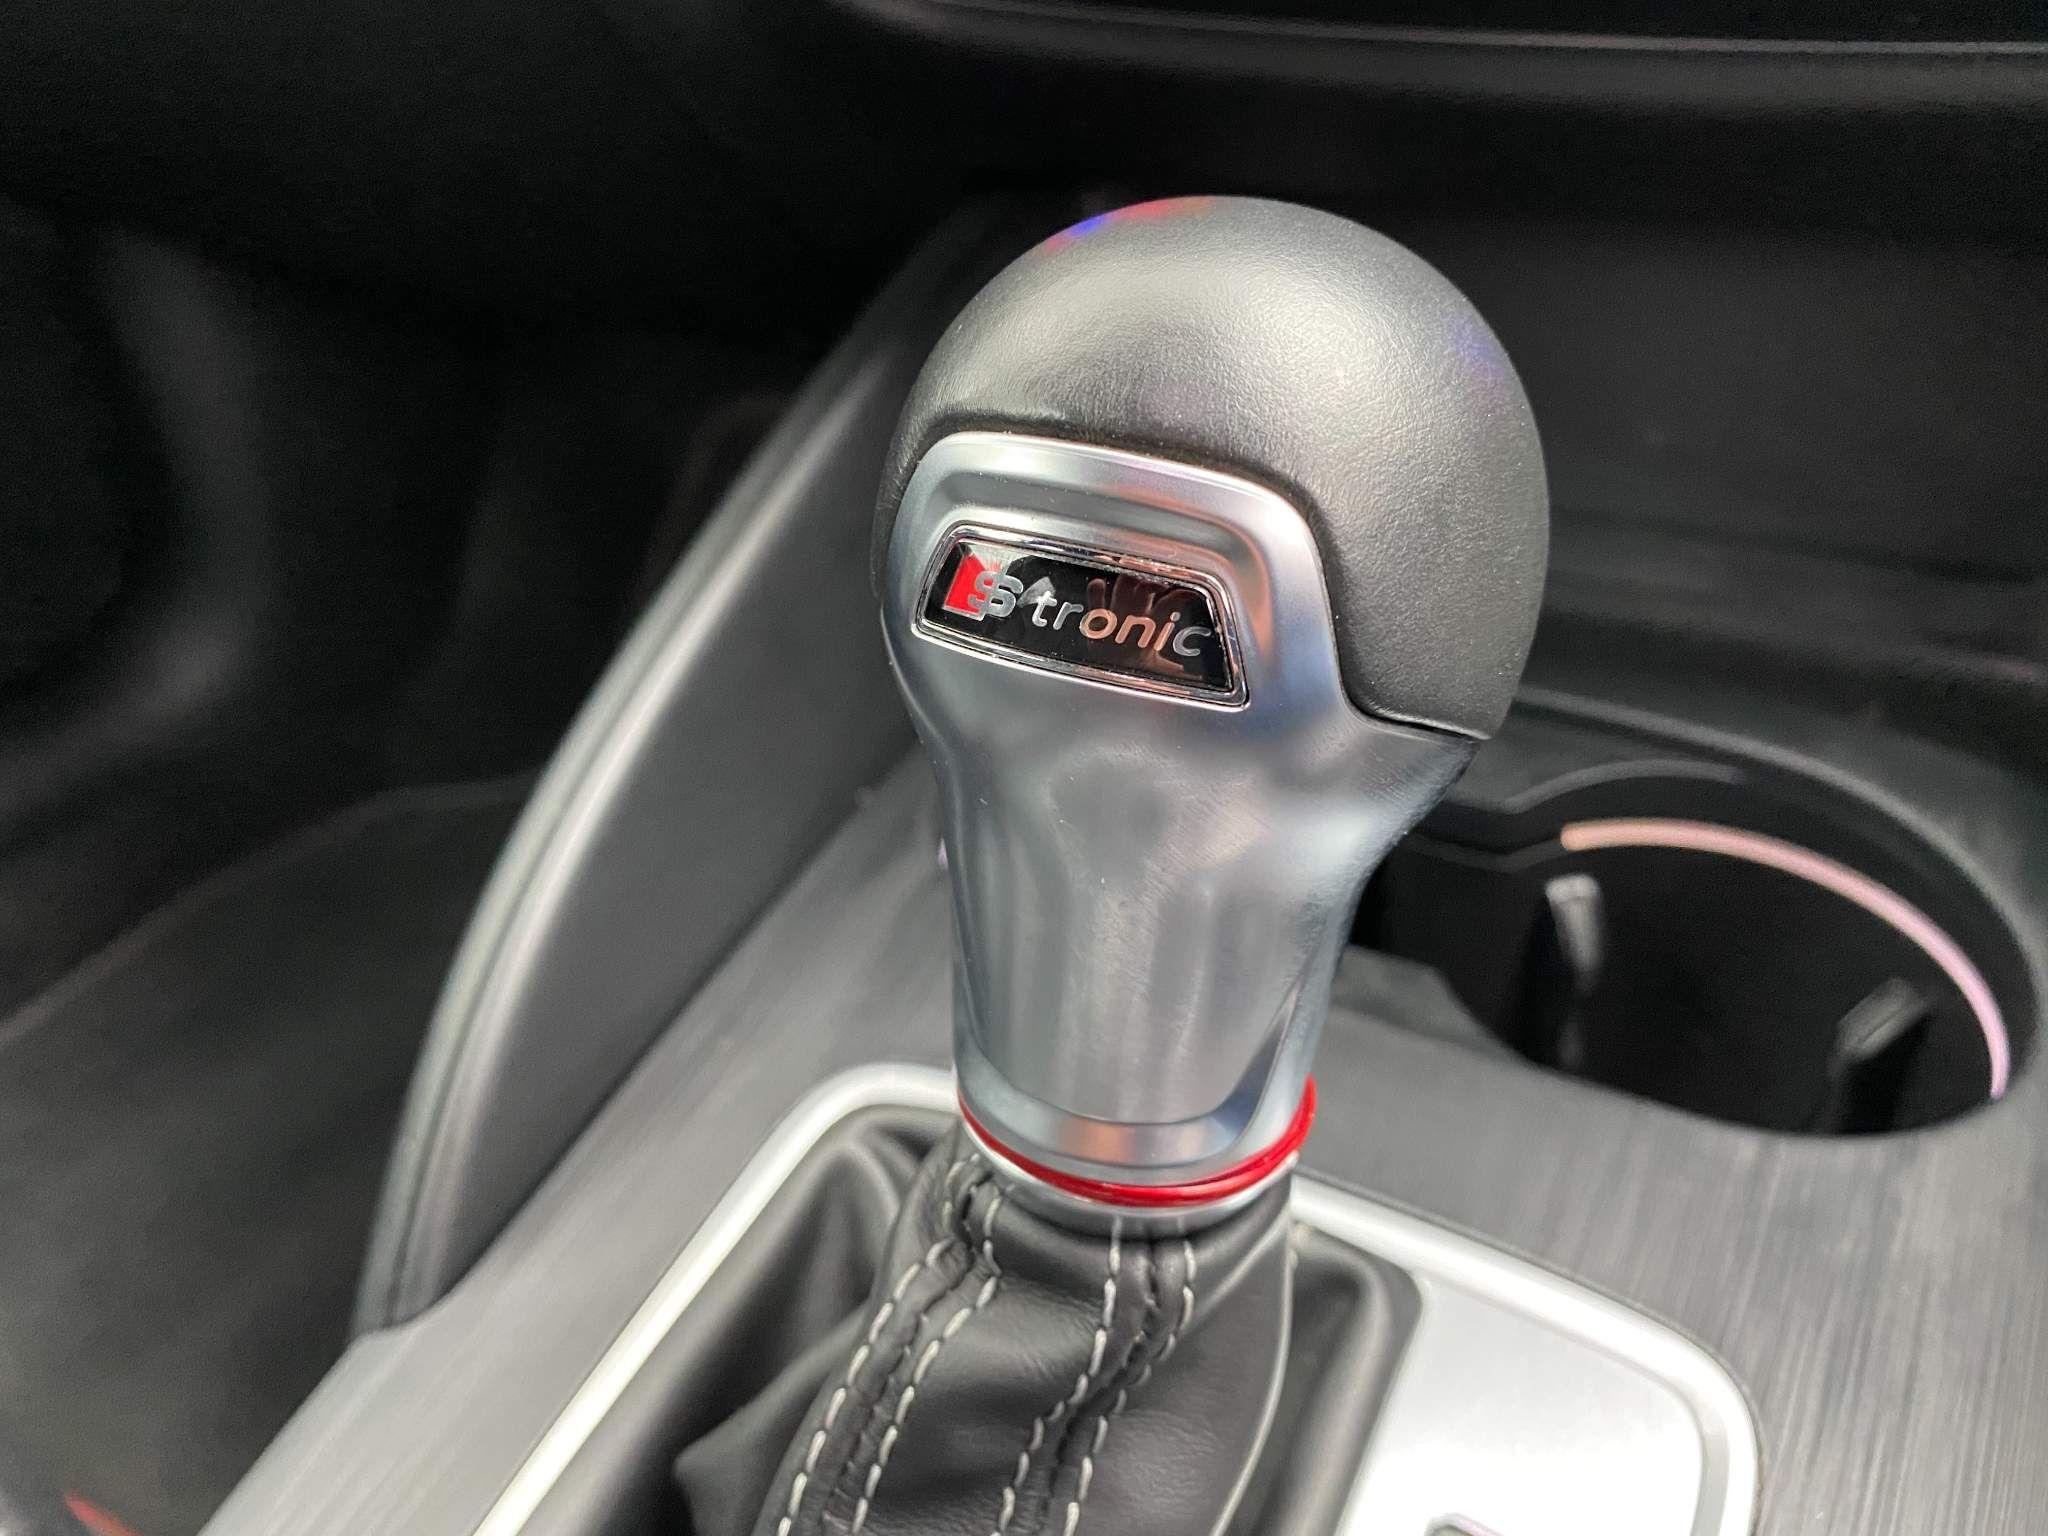 2017 Audi S3 2.0 TFSI S Tronic quattro (s/s) 4dr Petrol Automatic – Moyway Motors Dungannon full